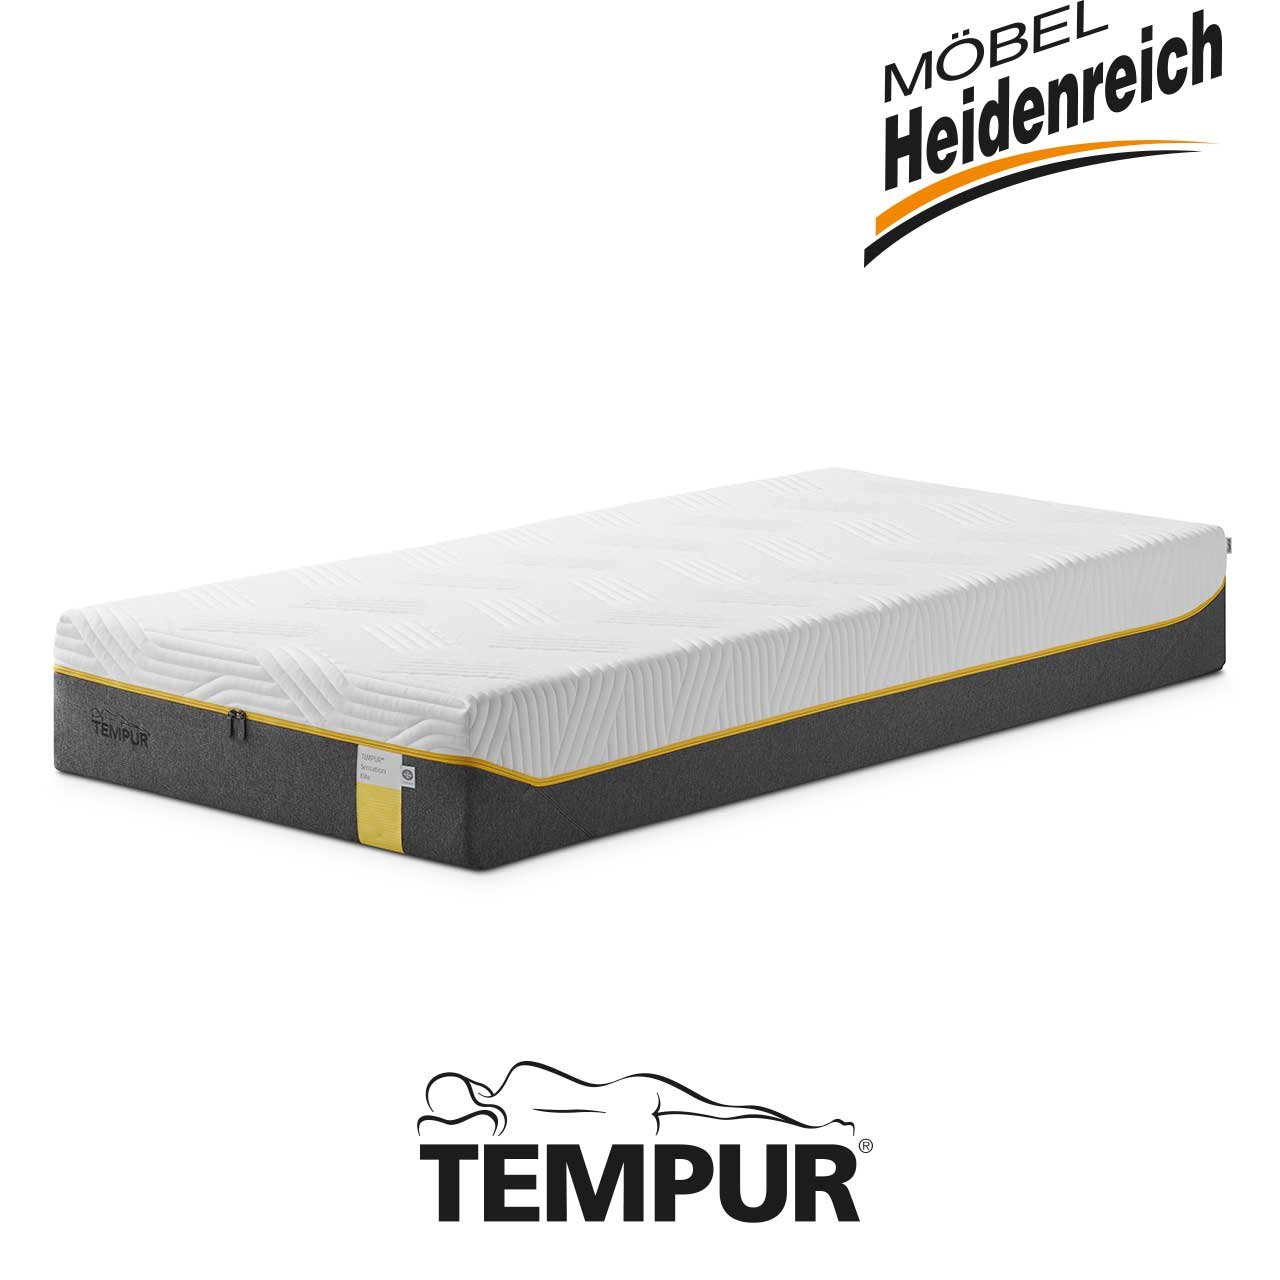 4a81116401e000 Tempur Matratze Sensation 25 zum Sonderpreis